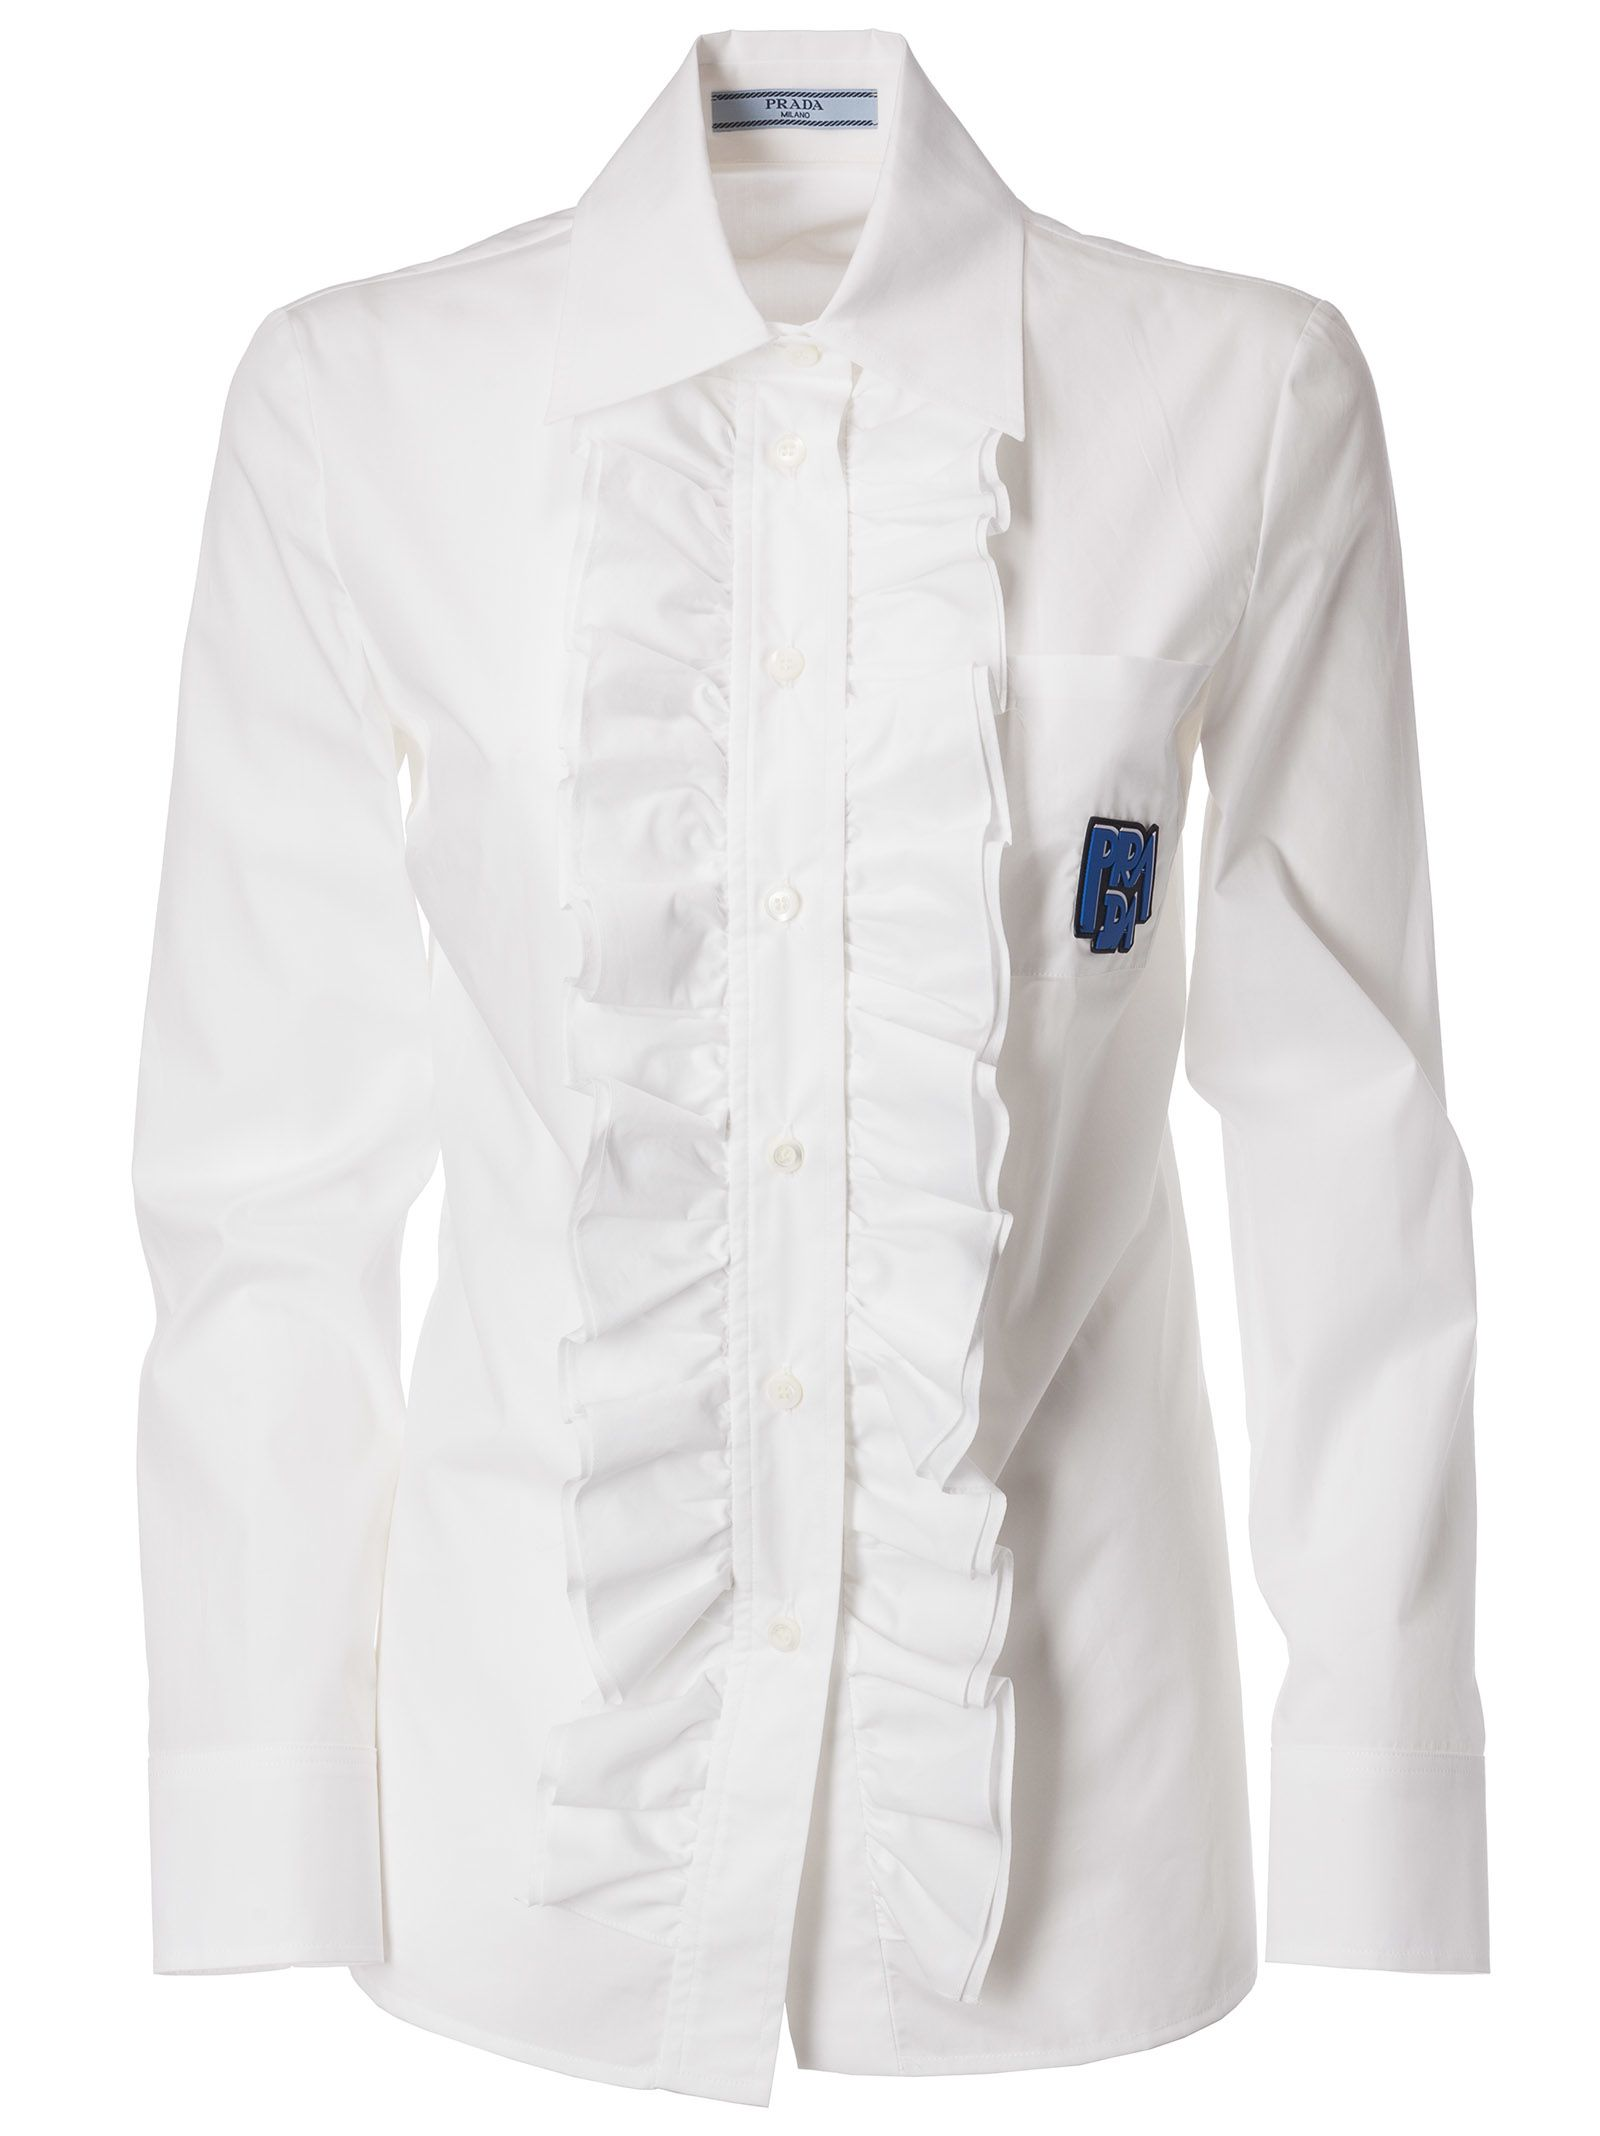 Prada Ruched Detail Shirt